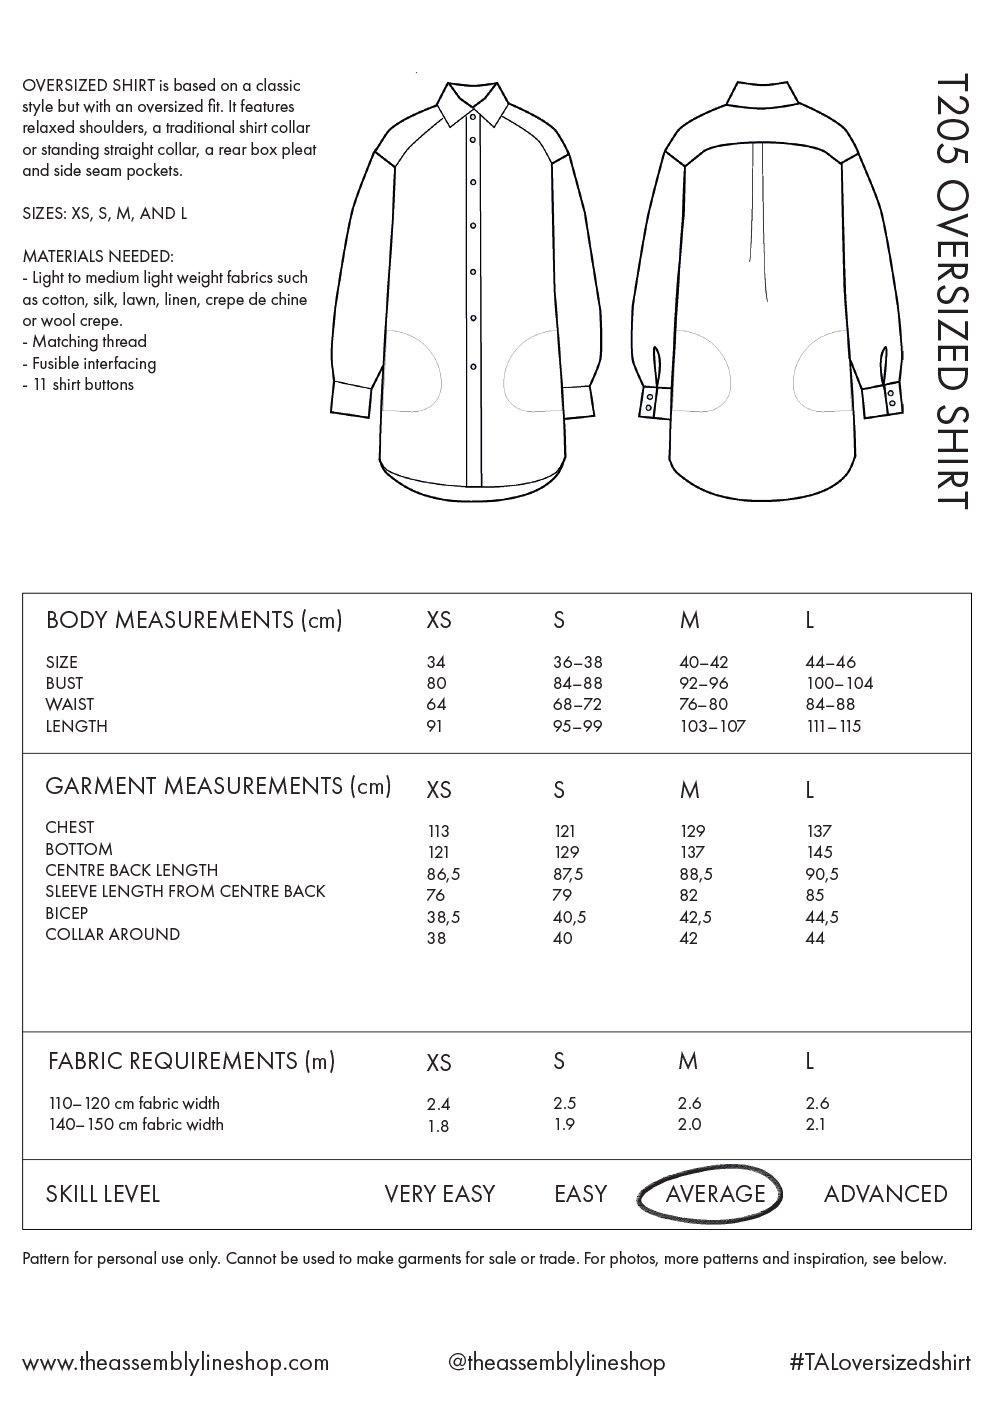 The Assembly Line Patterns Oversized Shirt XL-3XL pattern by The Assembly Line Patterns